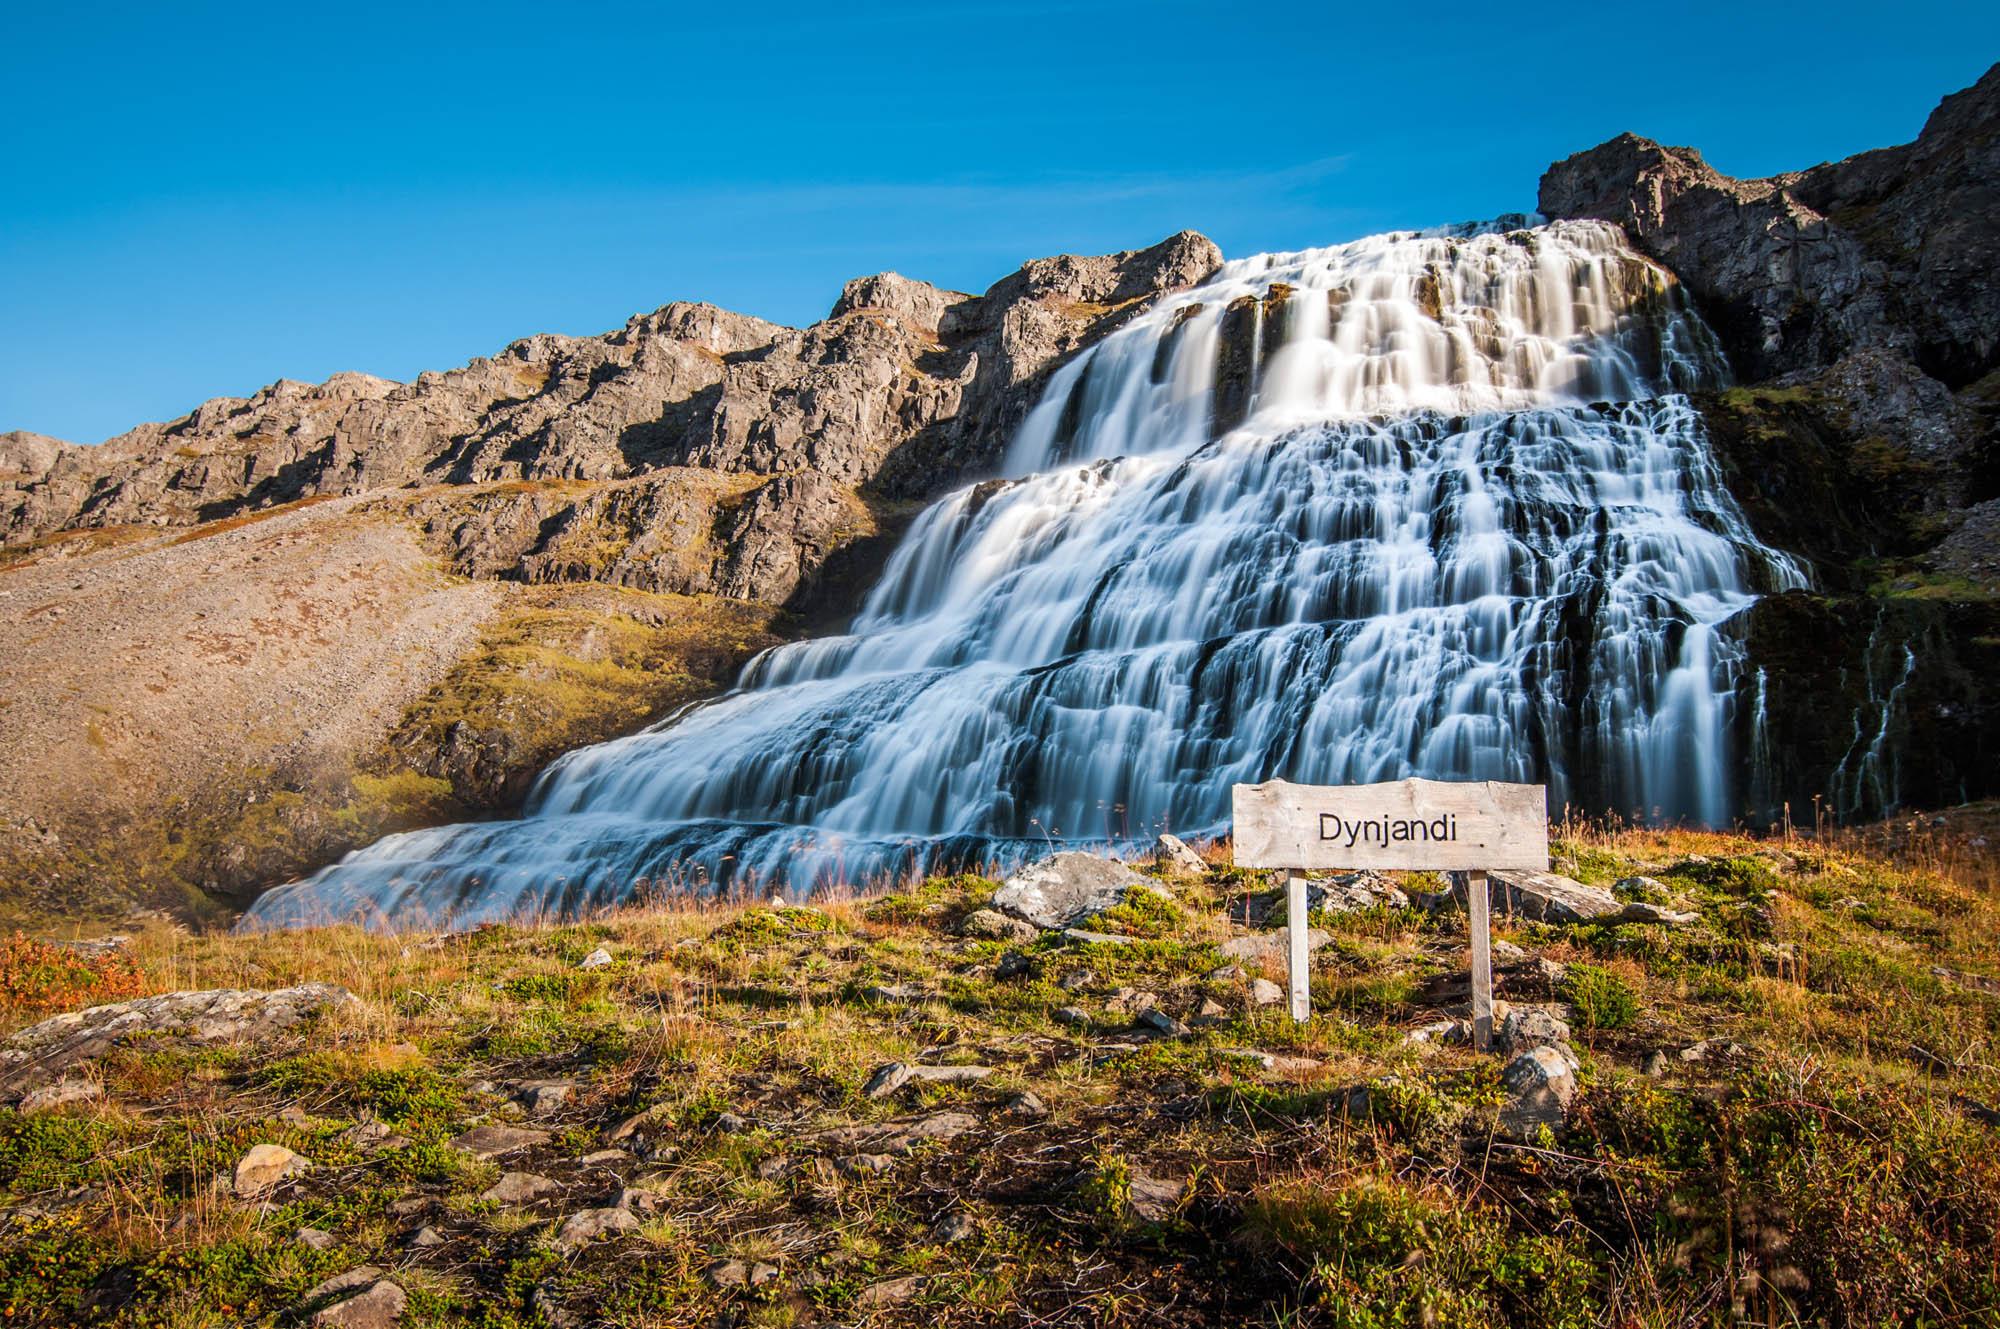 Dynjandi Waterfall - Westfjords Iceland